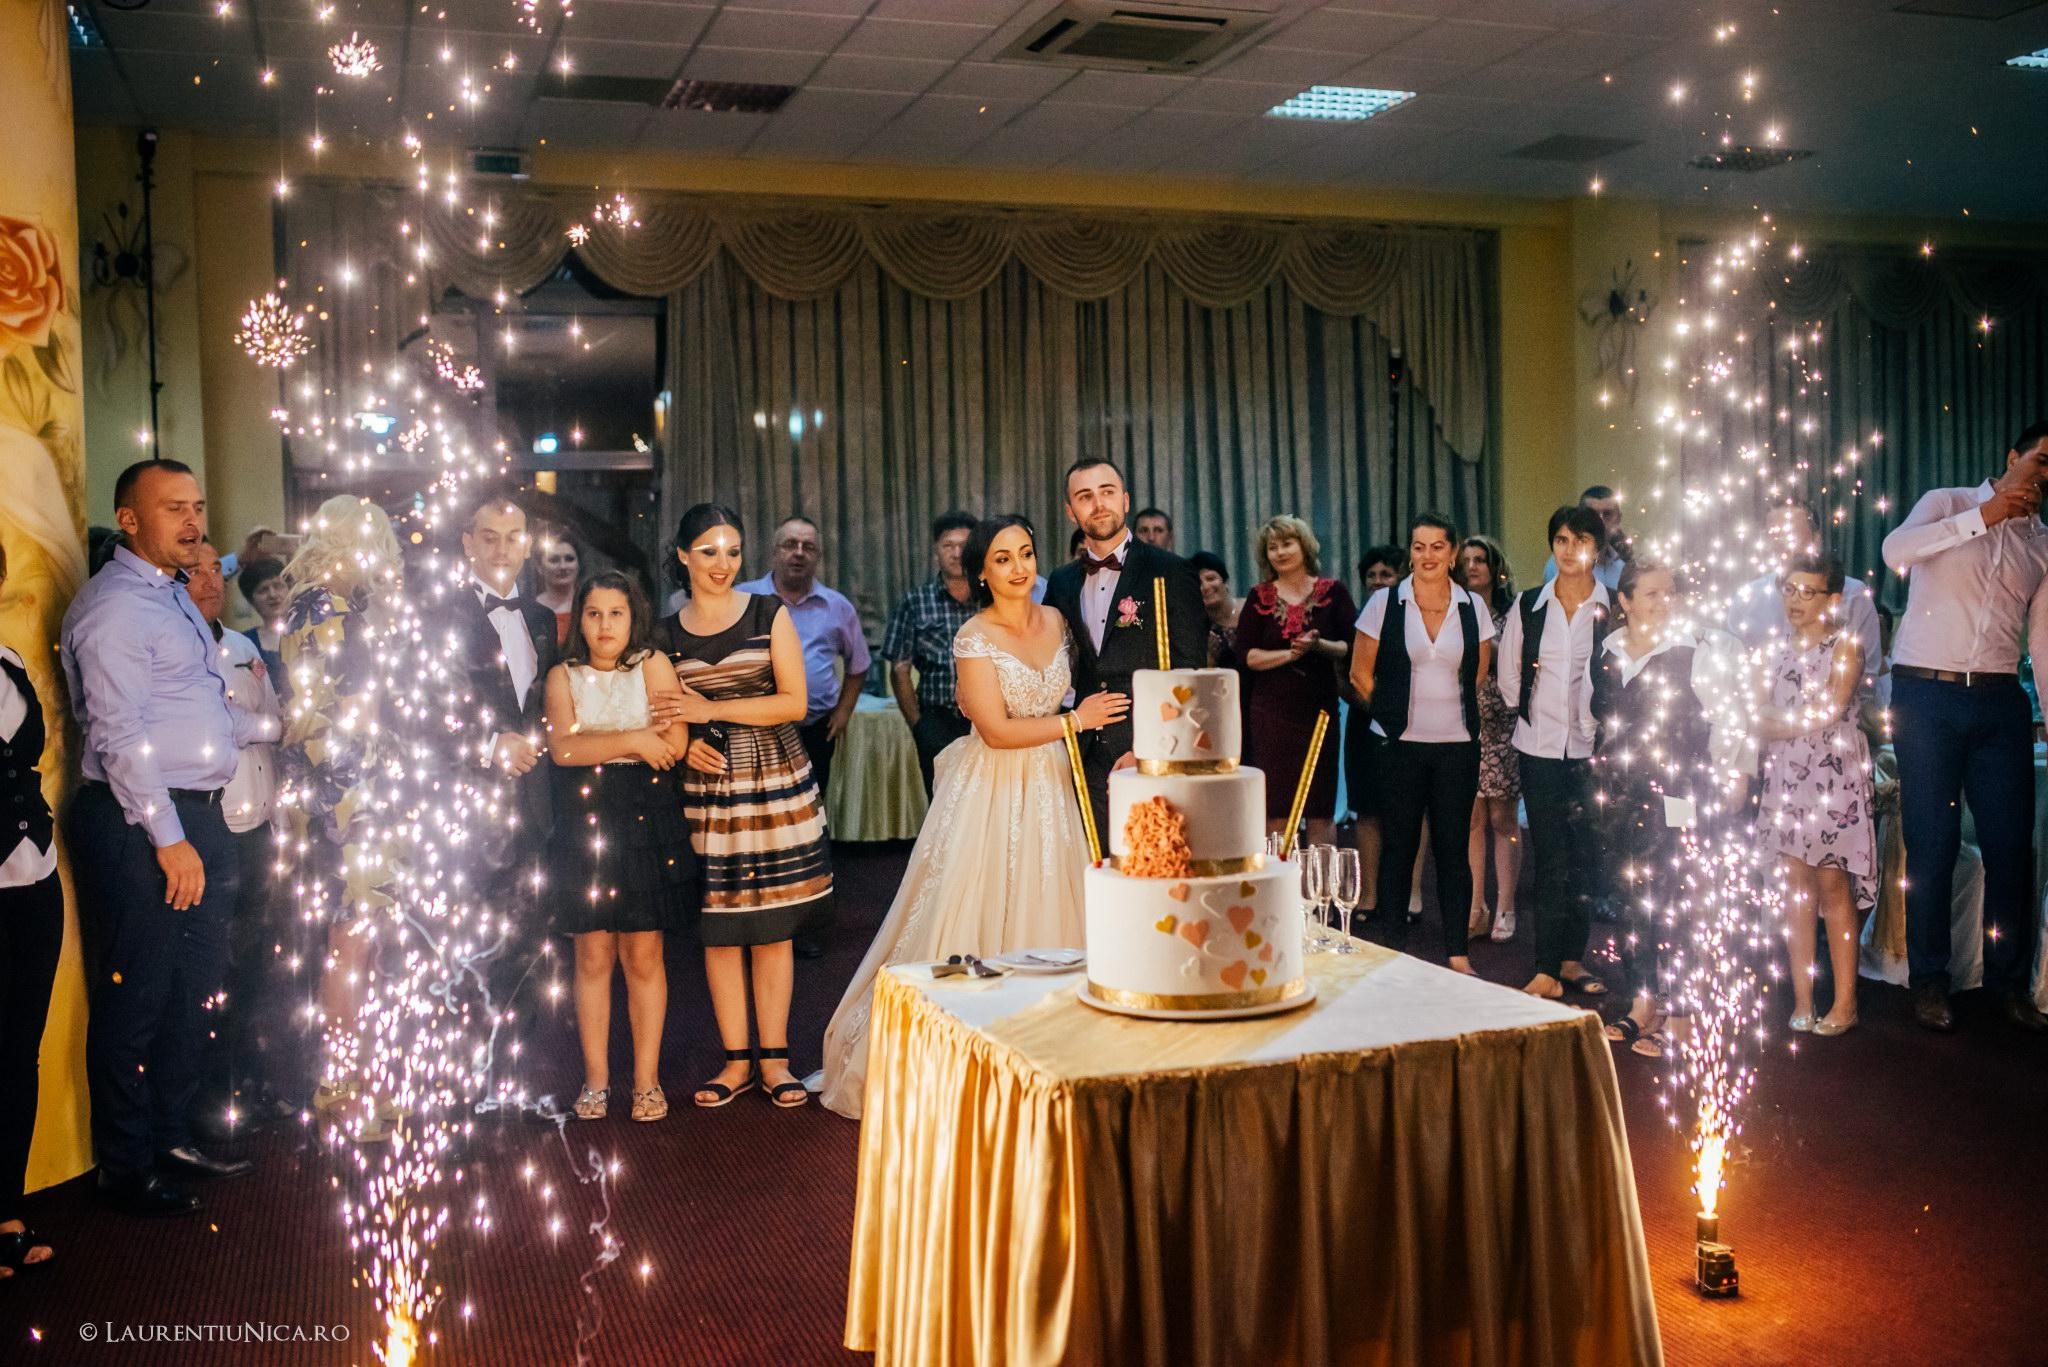 daiana si madalin fotograf nunta laurentiu nica targu jiu gorj 30 - Daiana & Madalin | Fotografii nunta | Targu-Jiu | Gorj